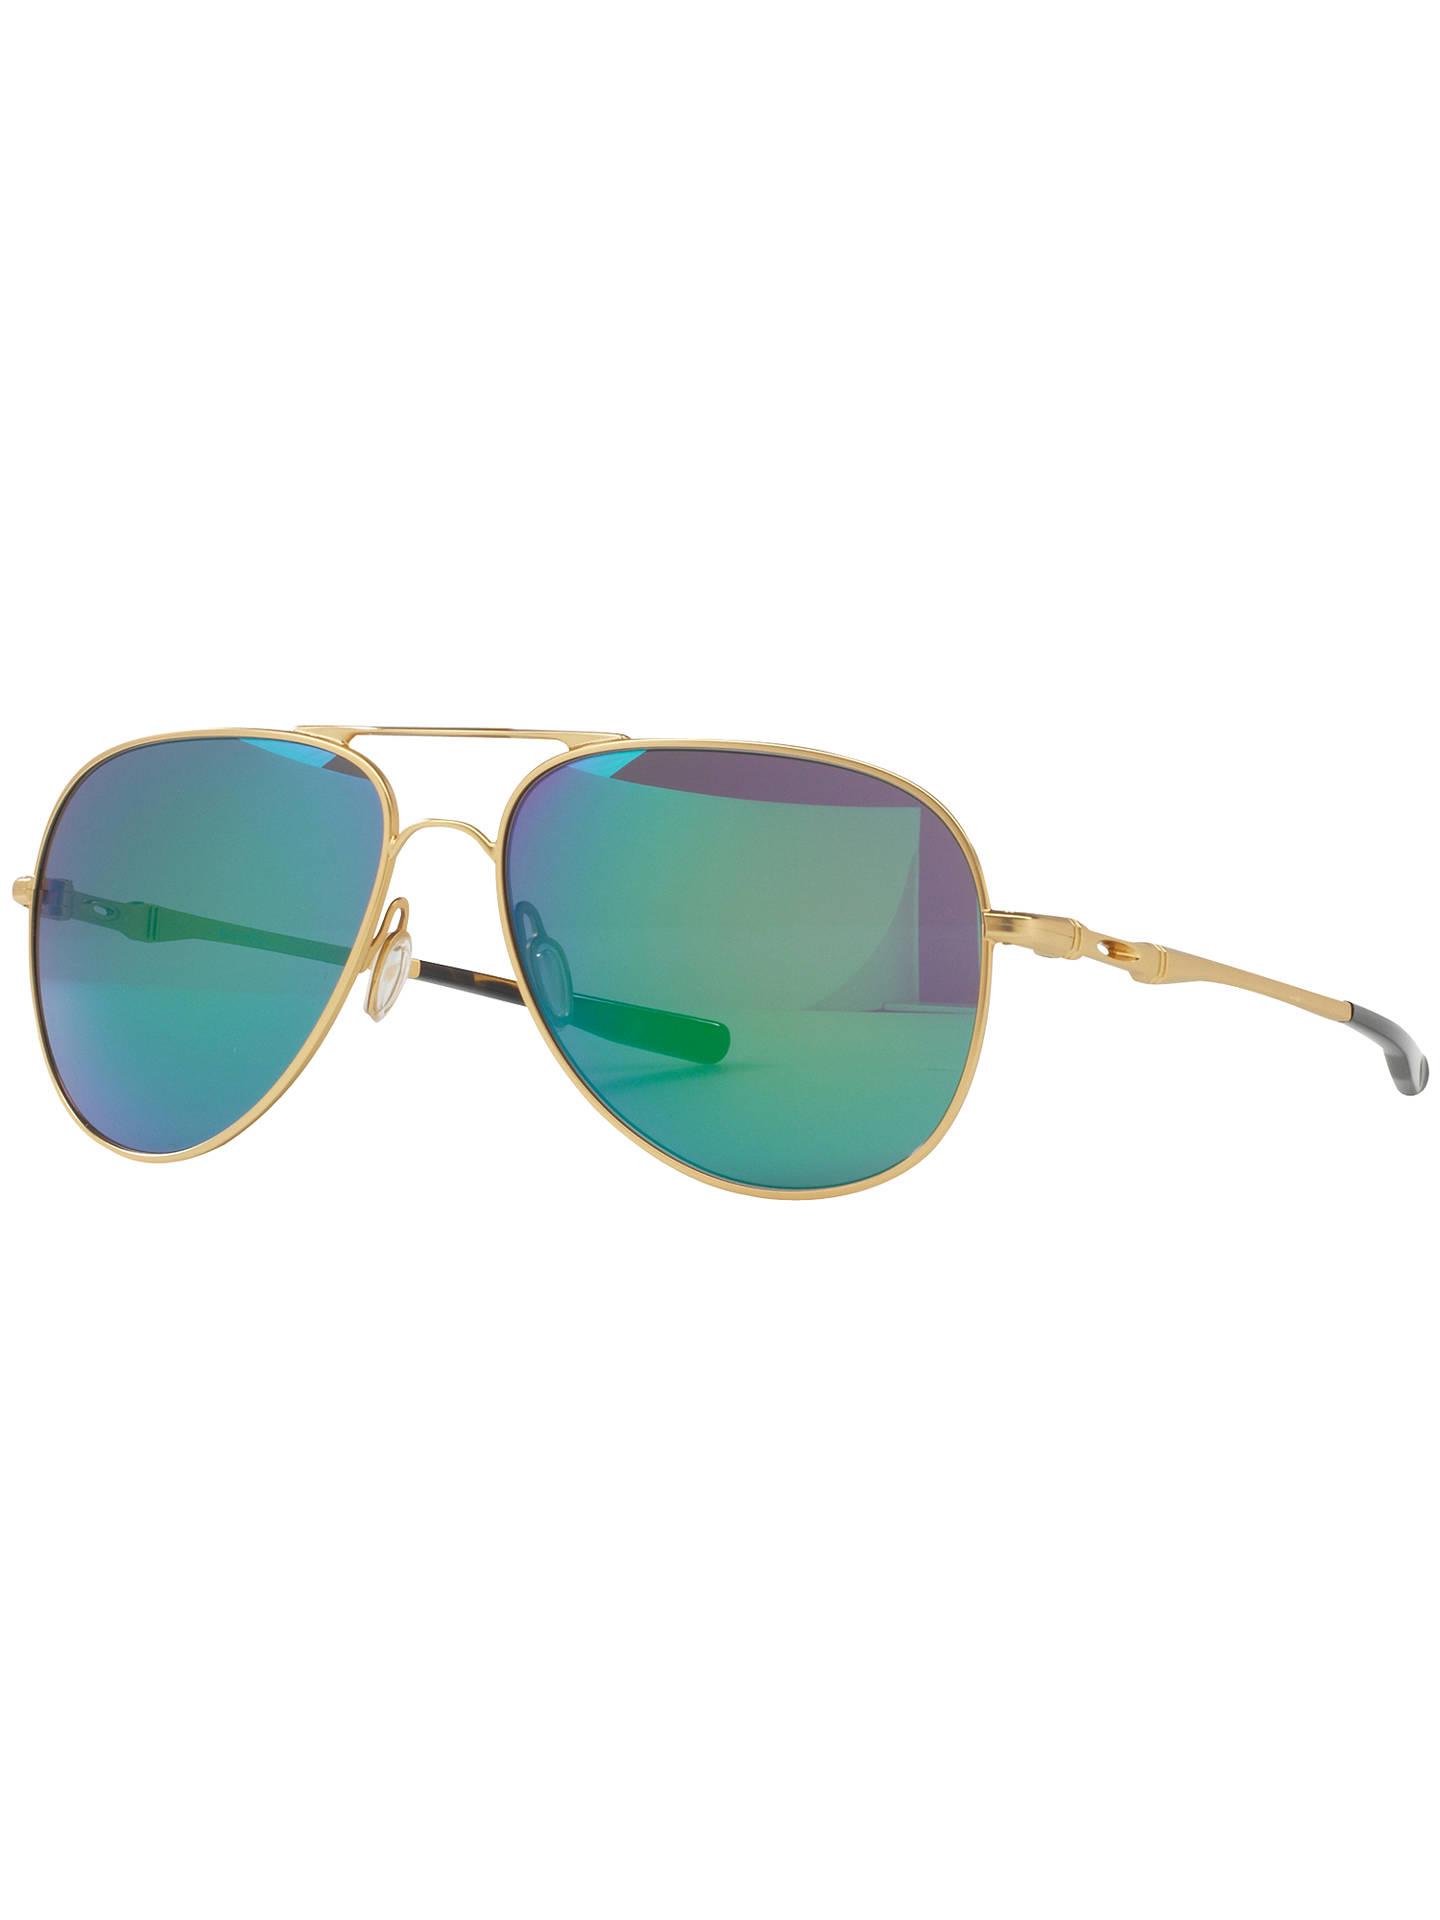 f9b7ed67133 Oakley OO4119 Elmont Medium Aviator Sunglasses at John Lewis   Partners